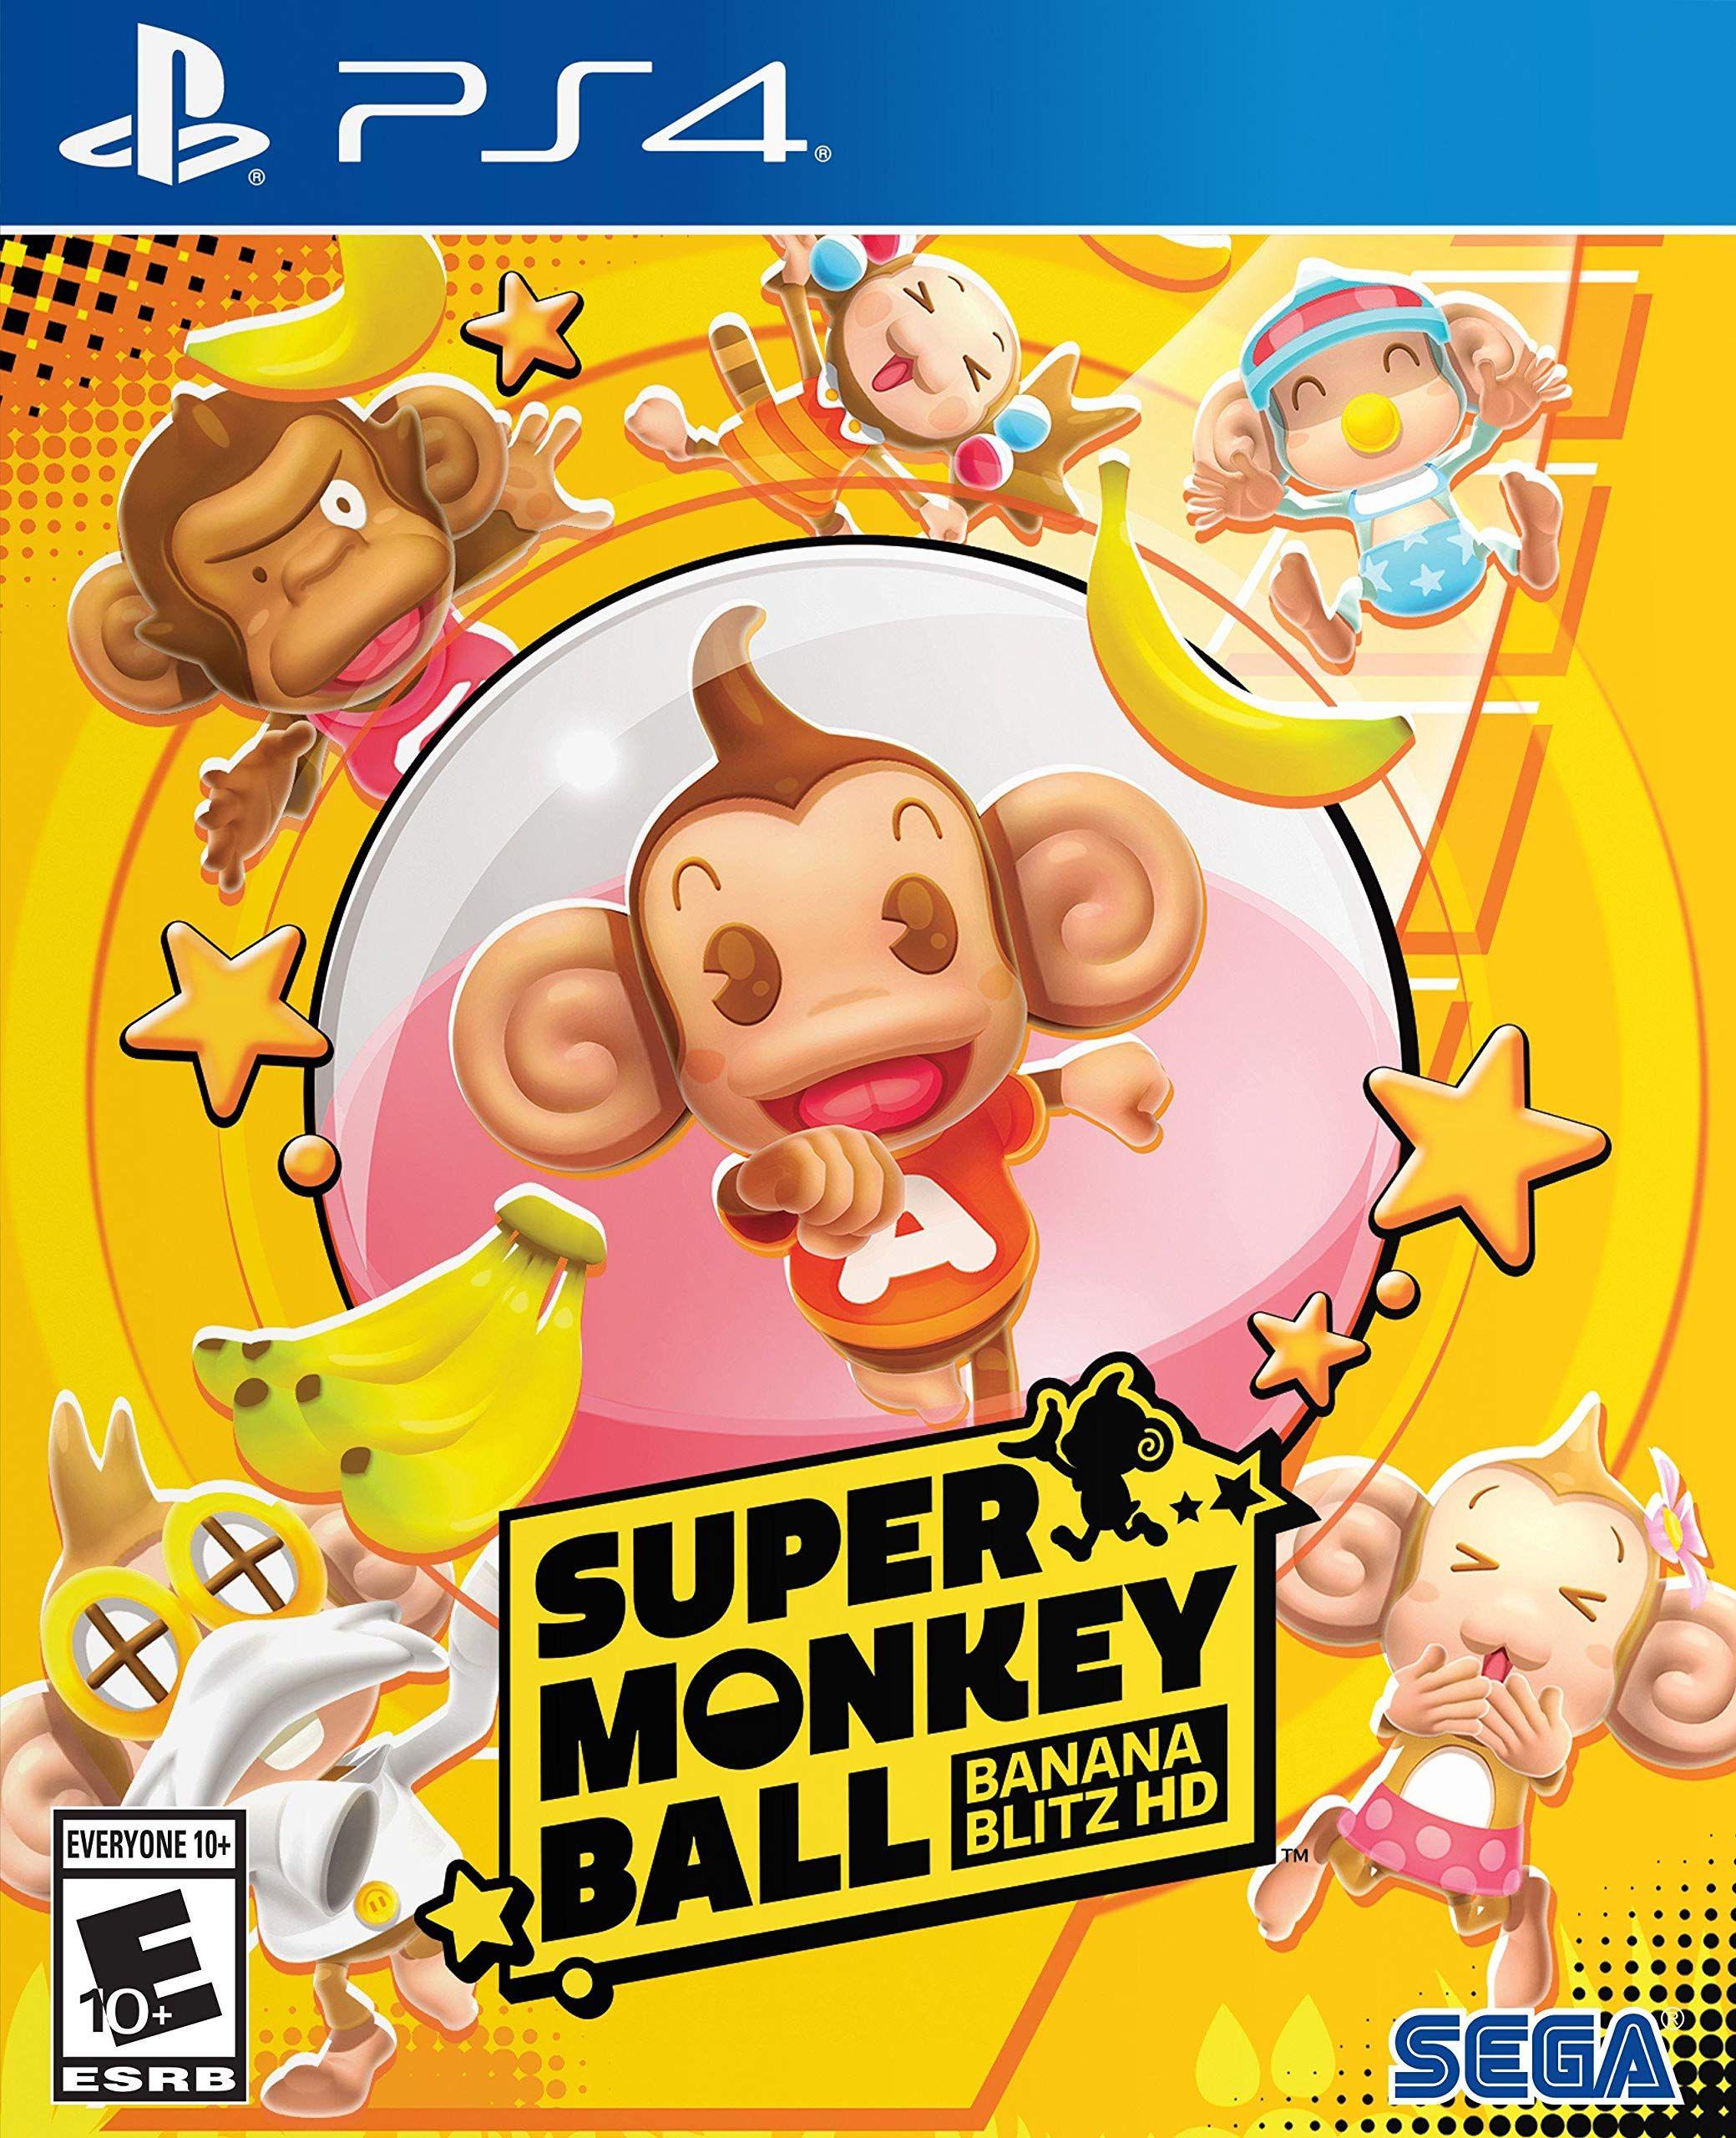 Super Monkey Ball Banana Blitz HD in 2020 Kids party